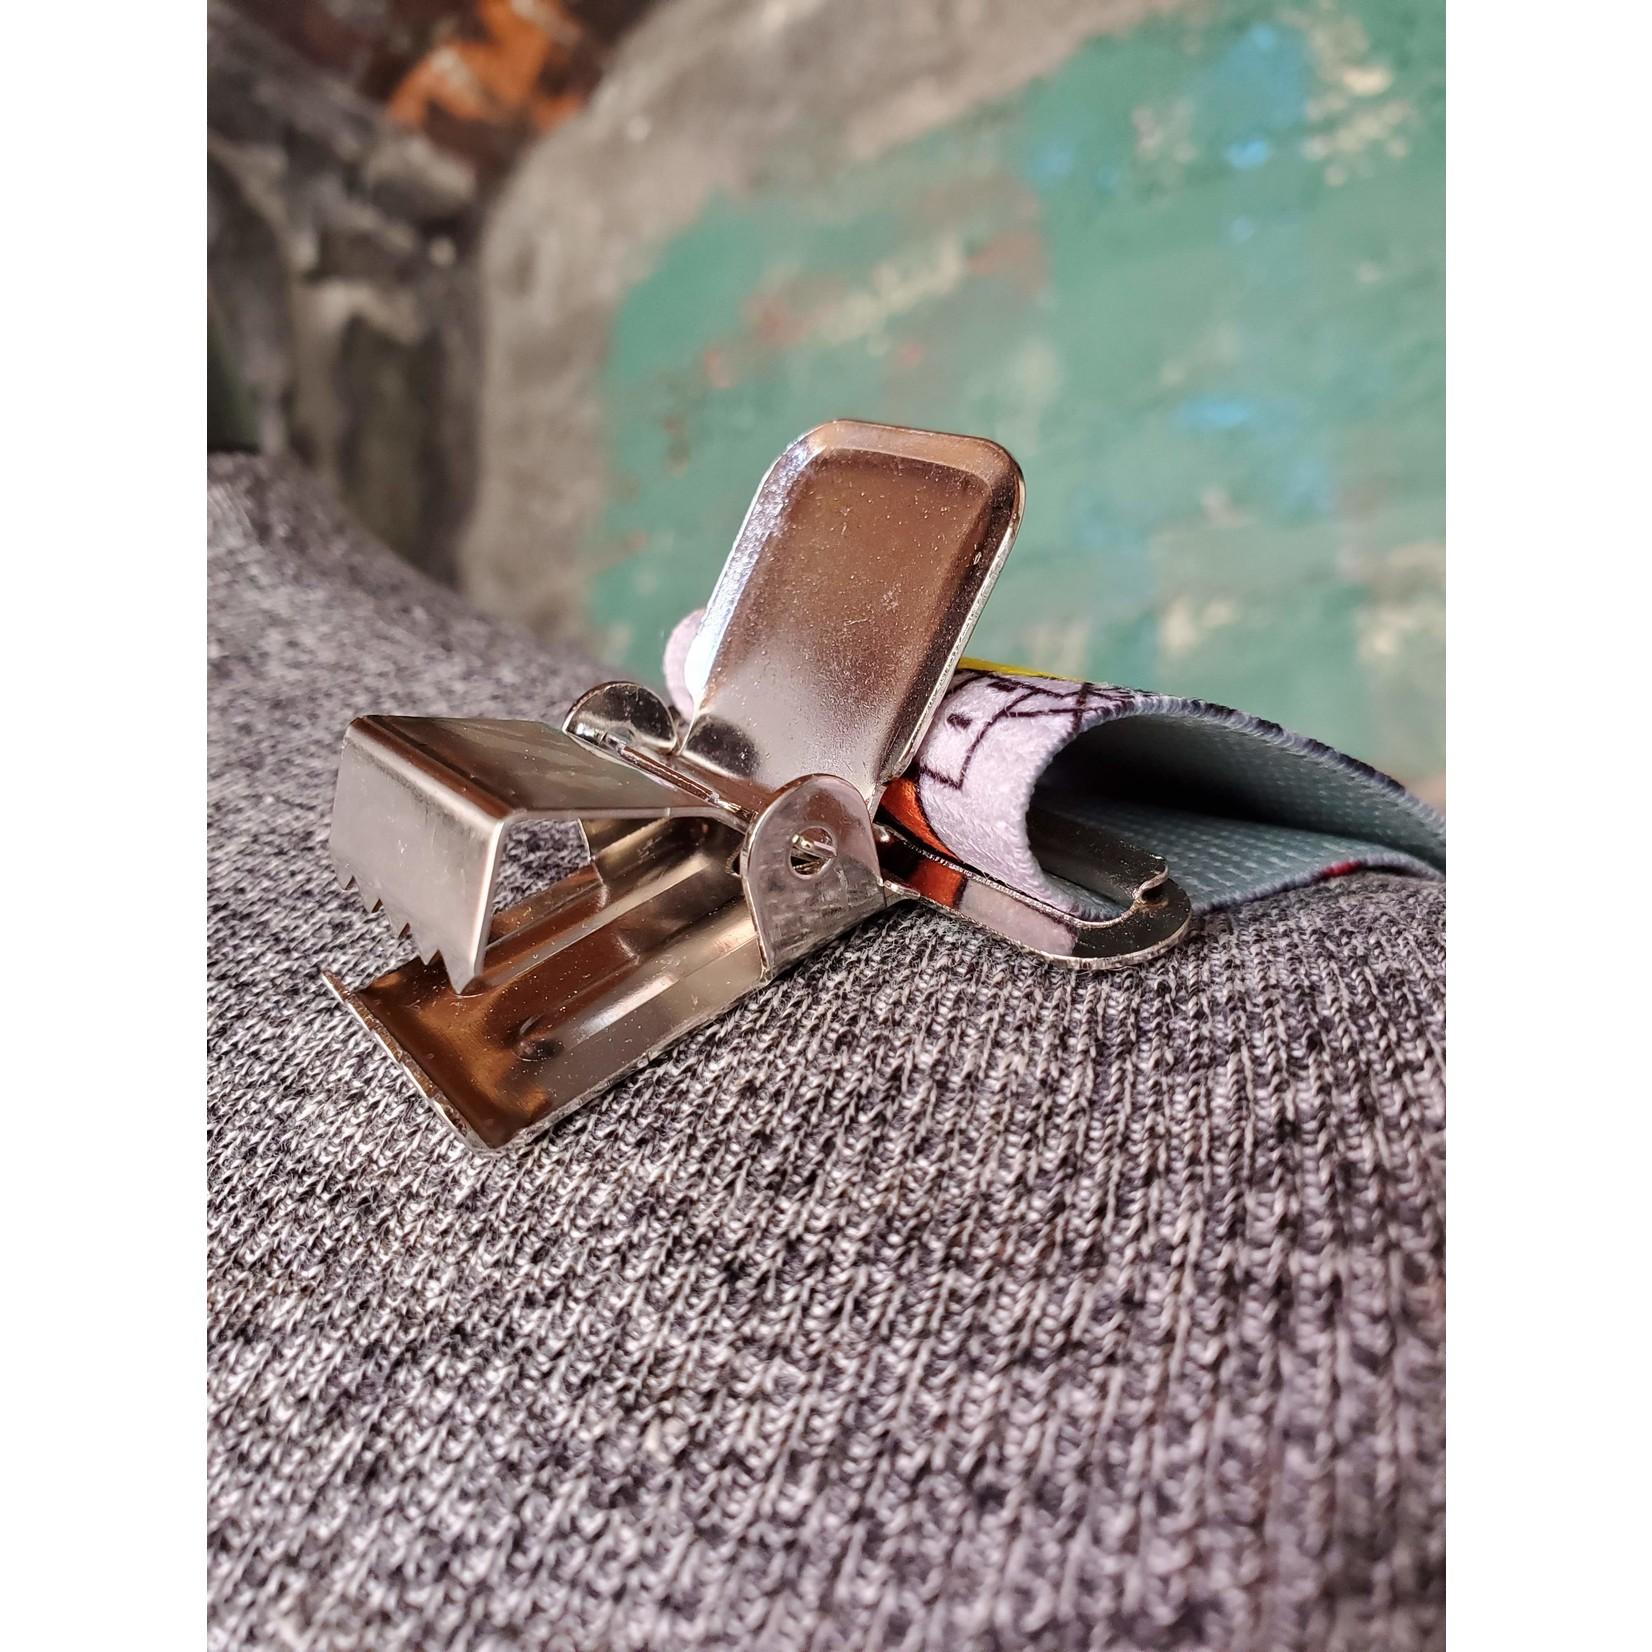 "Lynn Valley Mfg Lynn Valley Heavy Duty Novelty 2"" Clip Suspender SCR200-5EL Grey Electrician"